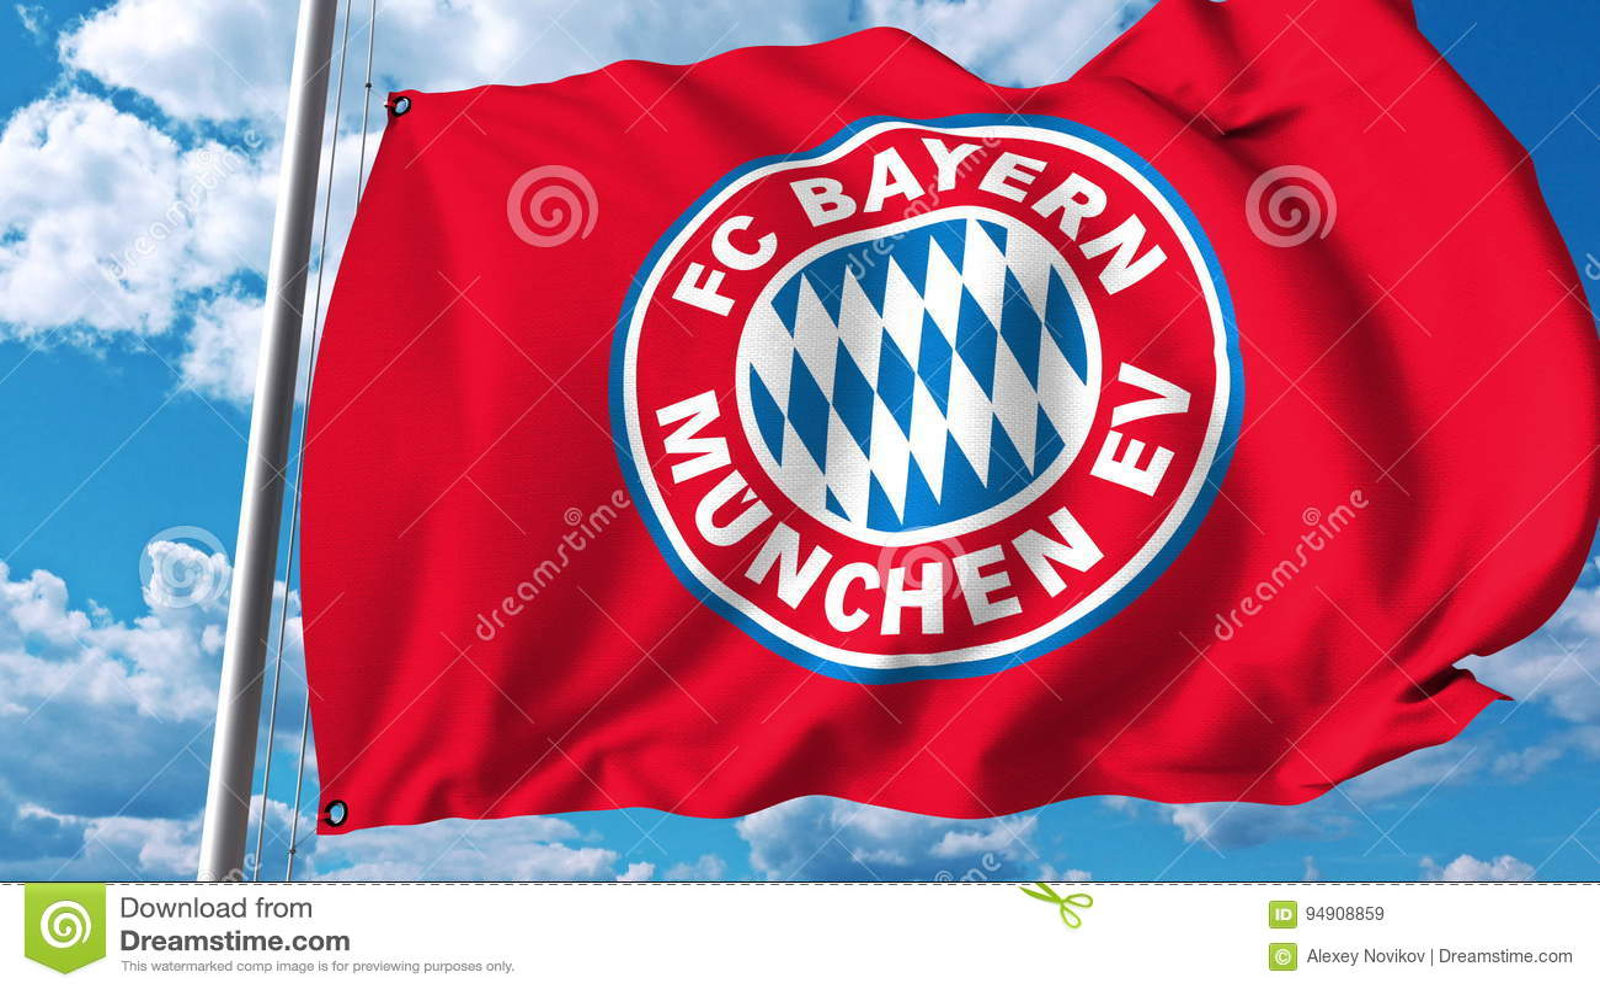 6a05112a17d Waving flag with Bayern Munchen football team logo. Editorial 3D. More  similar stock illustrations